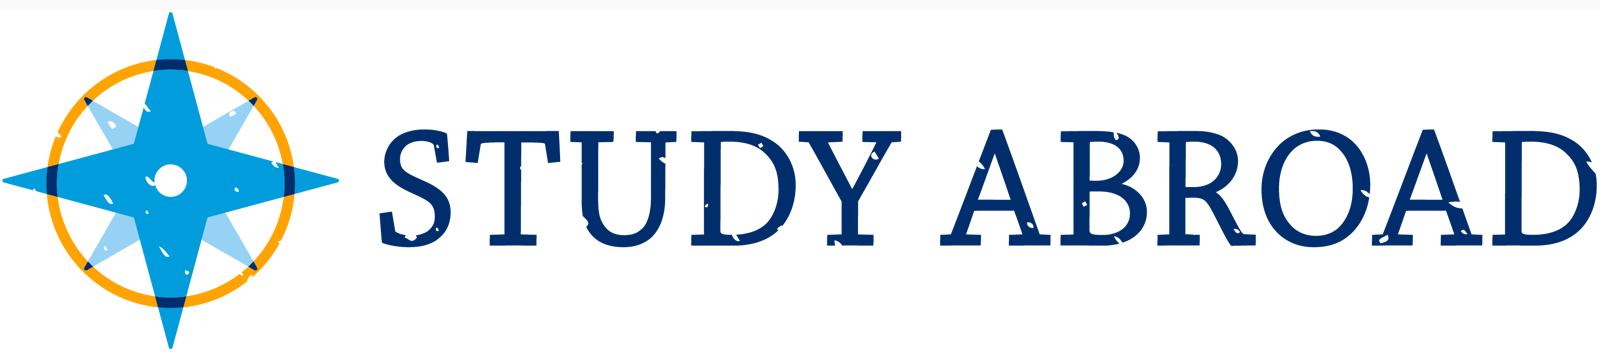 Study Abroad at Creighton